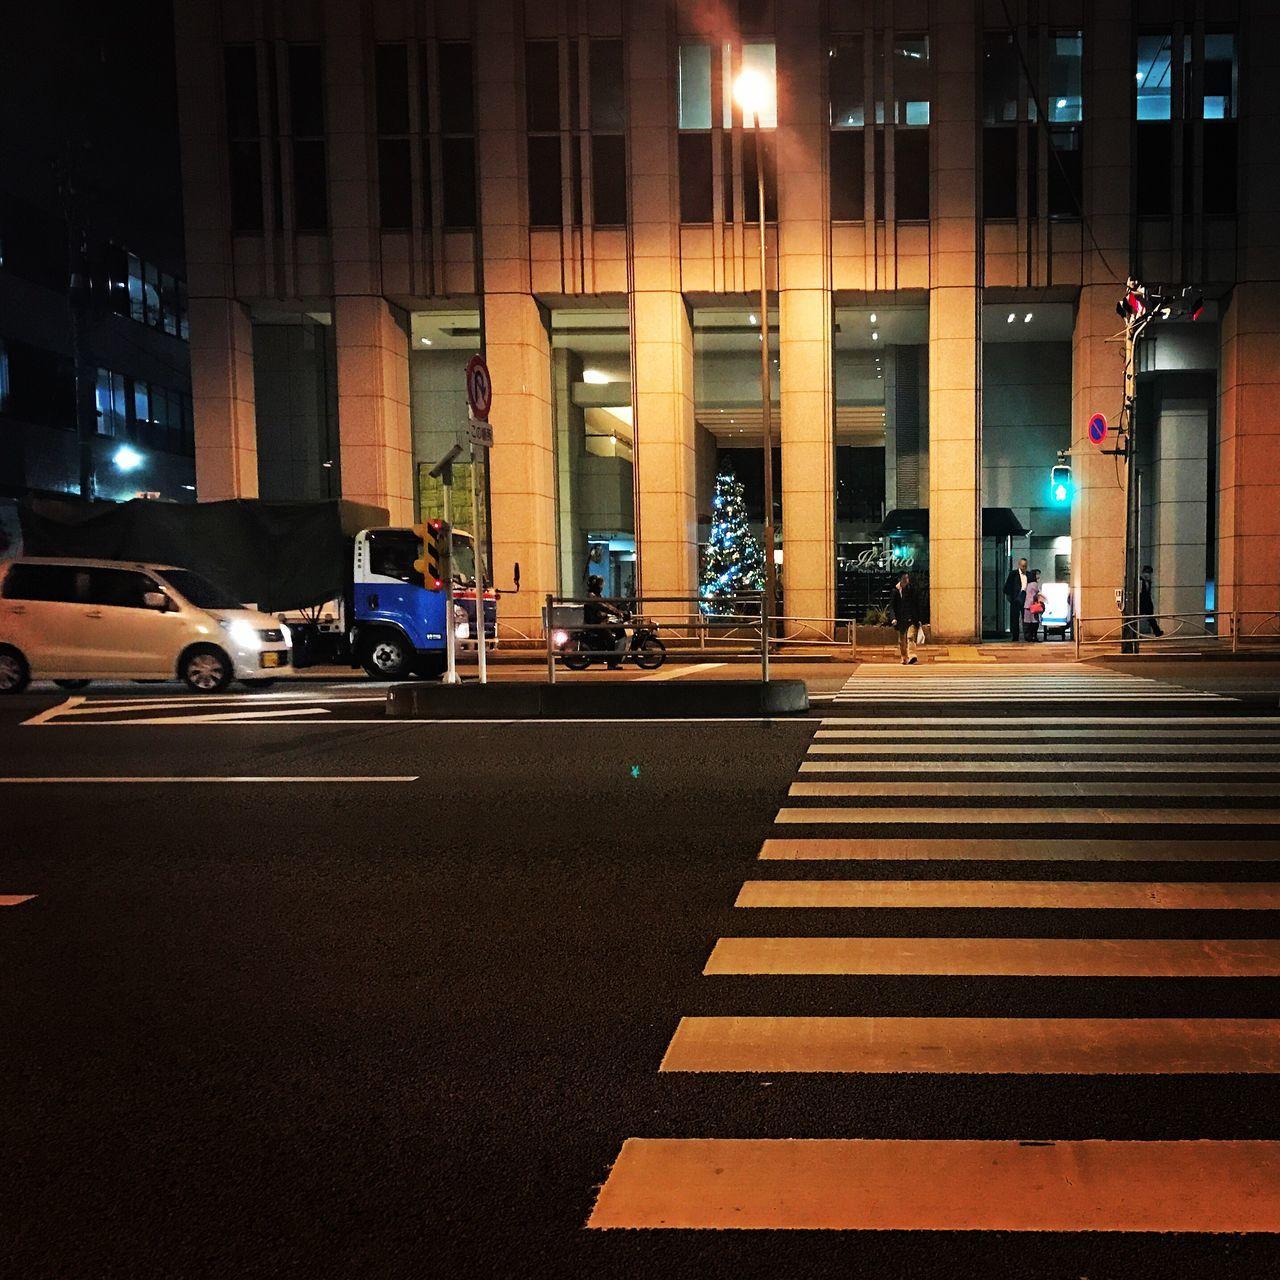 Tokyo Street Photography Day Light Street Architecture Crossroads Night Night Lights Night View Nighttime Nightphotography Night Photography Nightshot Tokyo,Japan Tokyo Night